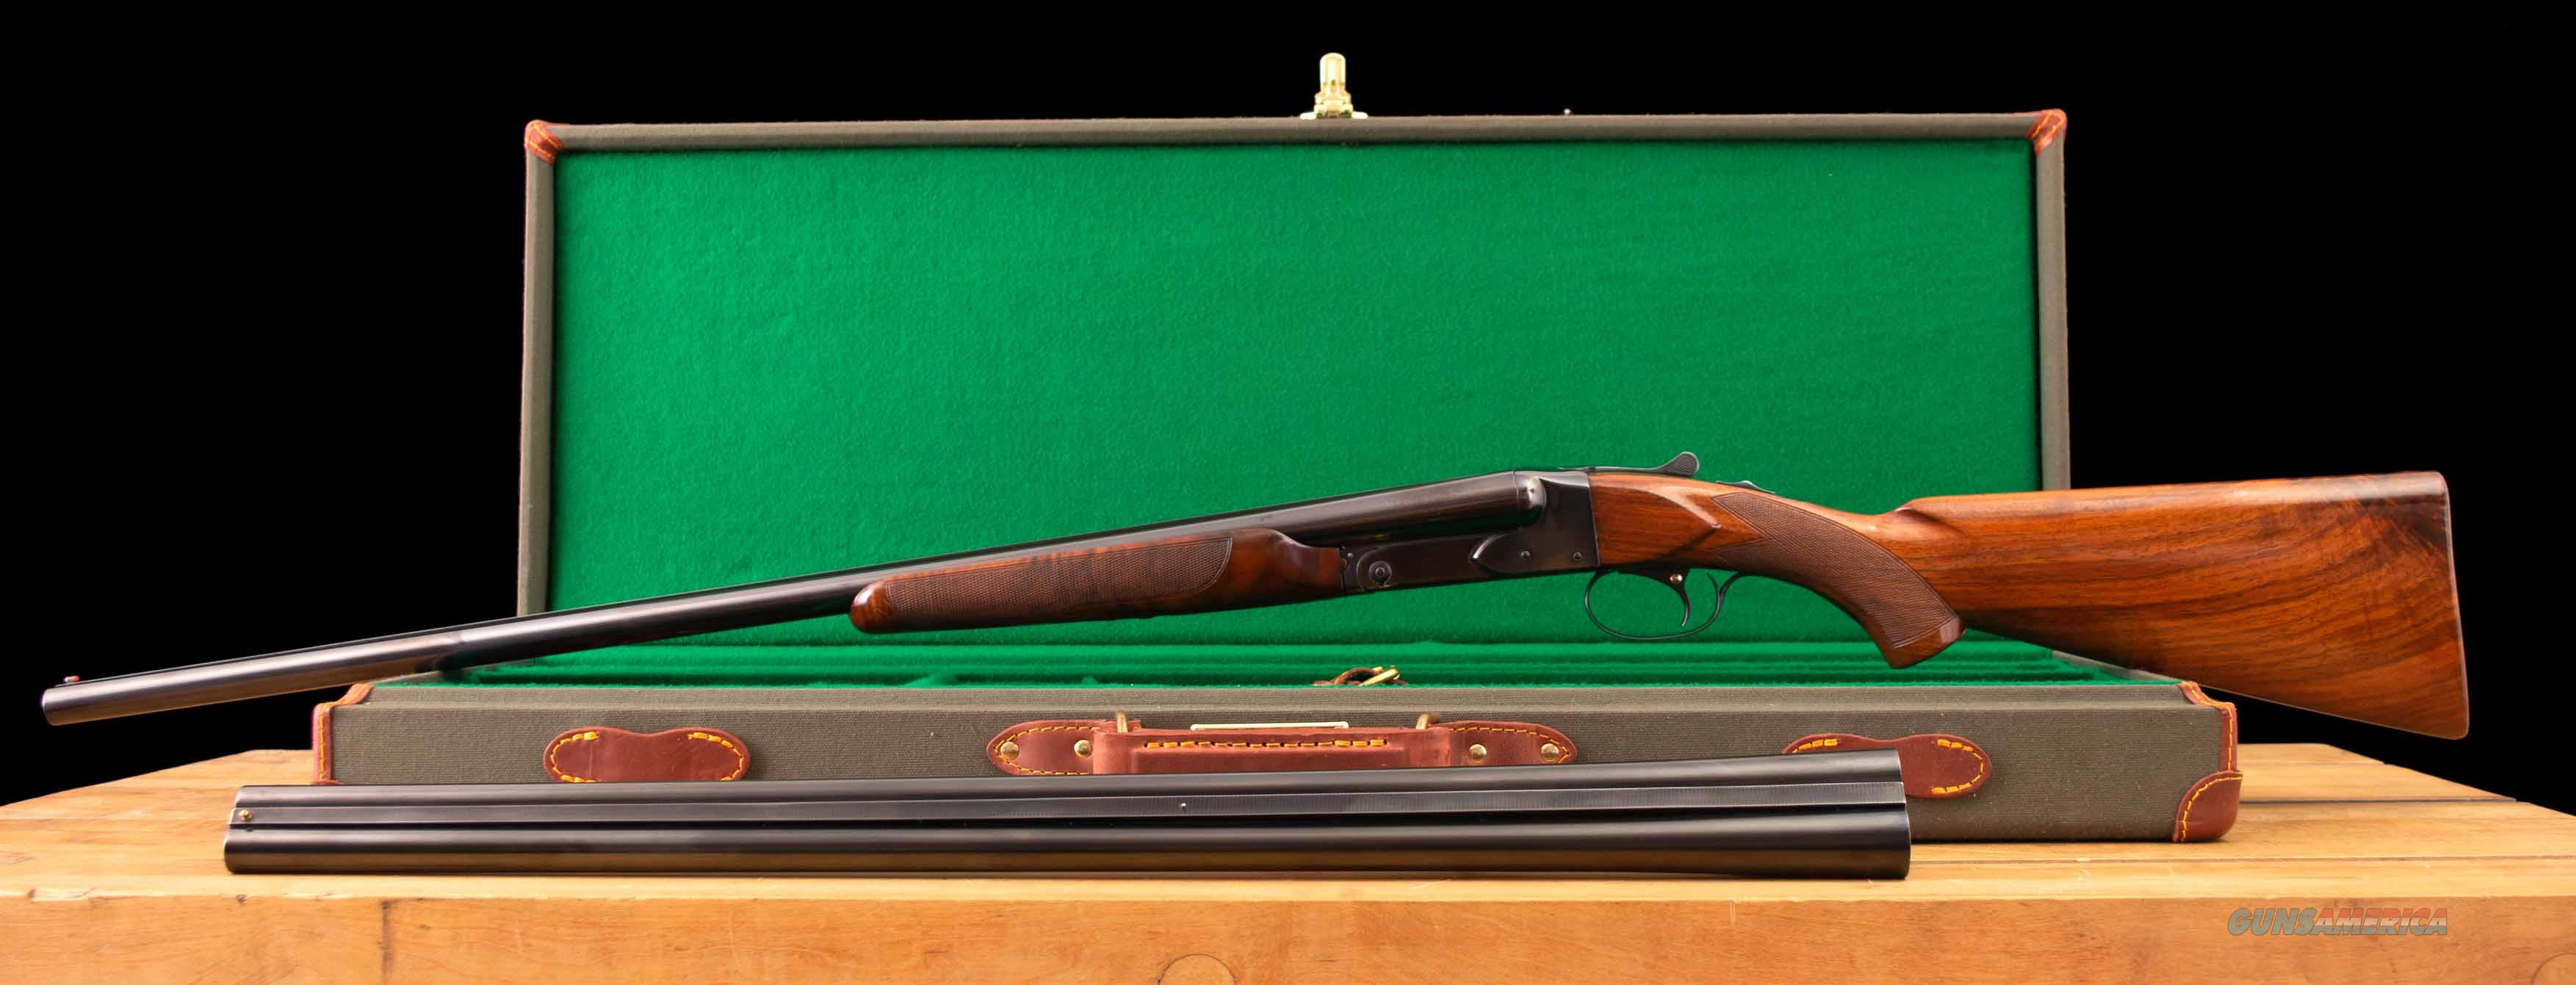 Winchester Model 21 16 Gauge SKEET – TWO BARREL SET, CASED, vintage firearms inc  Guns > Shotguns > Winchester Shotguns - Modern > SxS